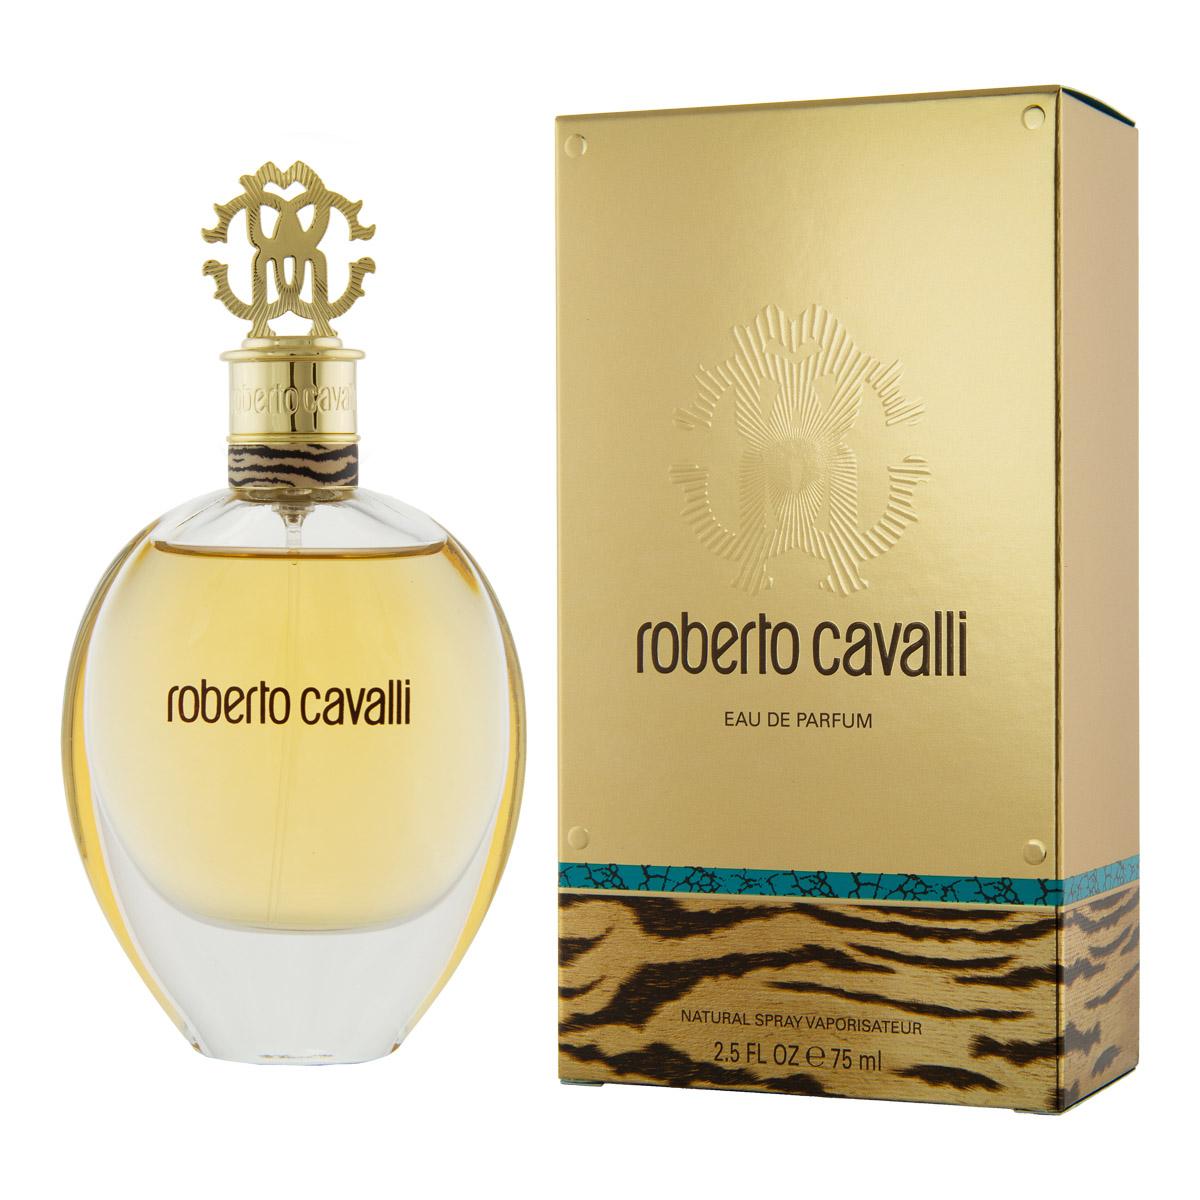 Roberto Cavalli Roberto Cavalli Eau de Parfum Eau De Parfum 75 ml (woman) 67133